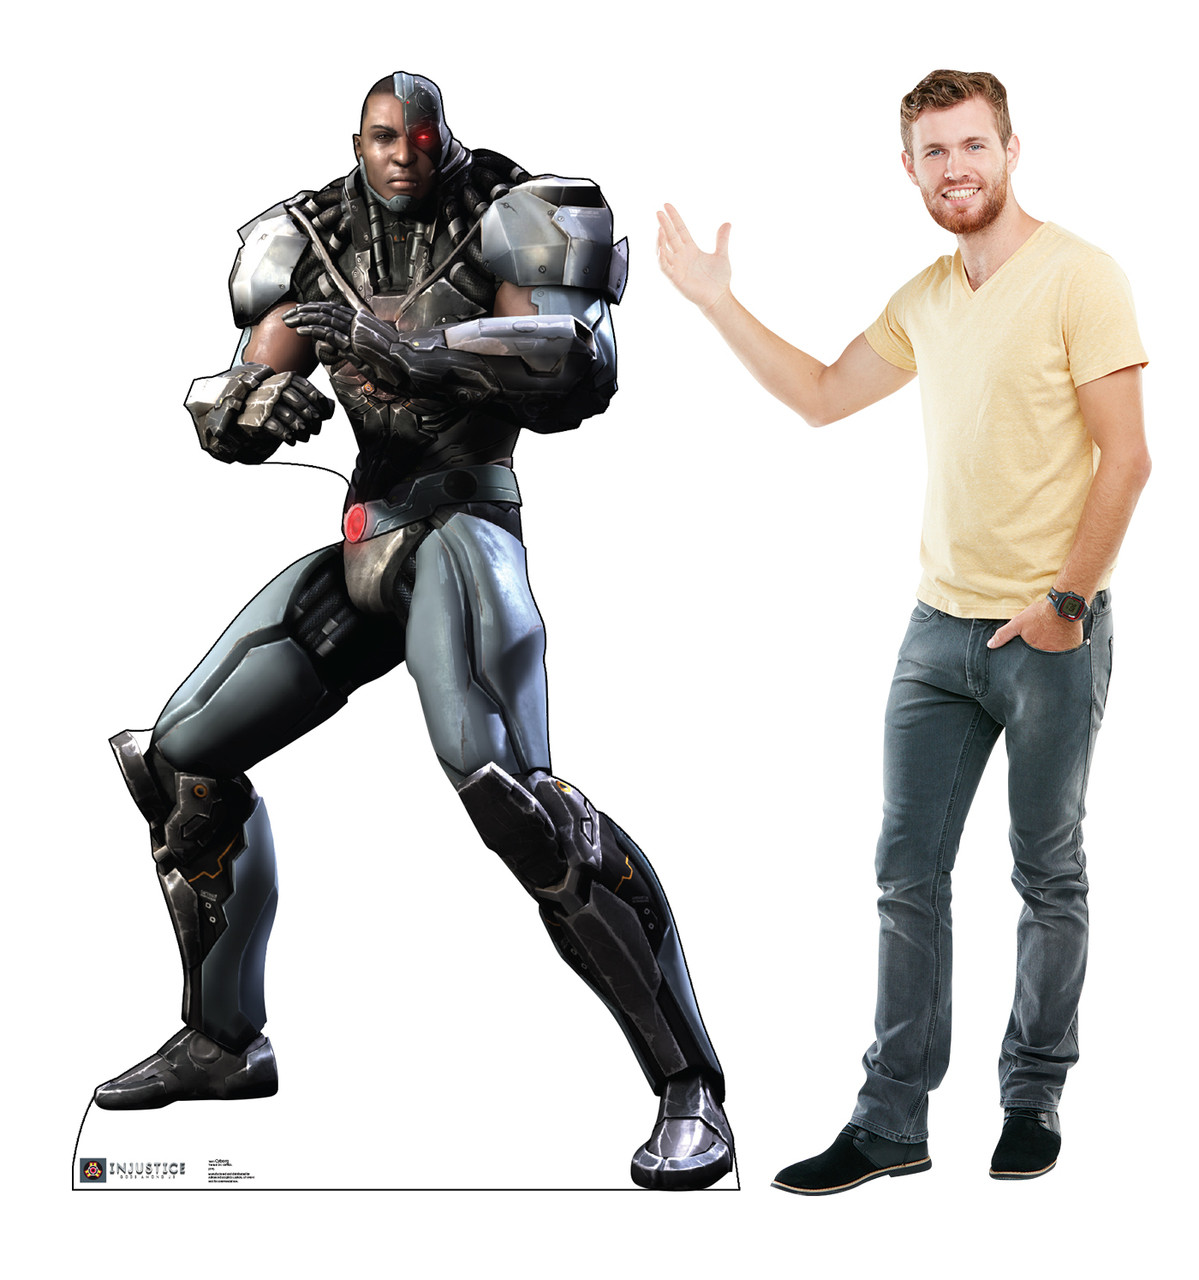 Life-size Cyborg - Injustice Gods Among Us Cardboard Standup | Cardboard Cutout